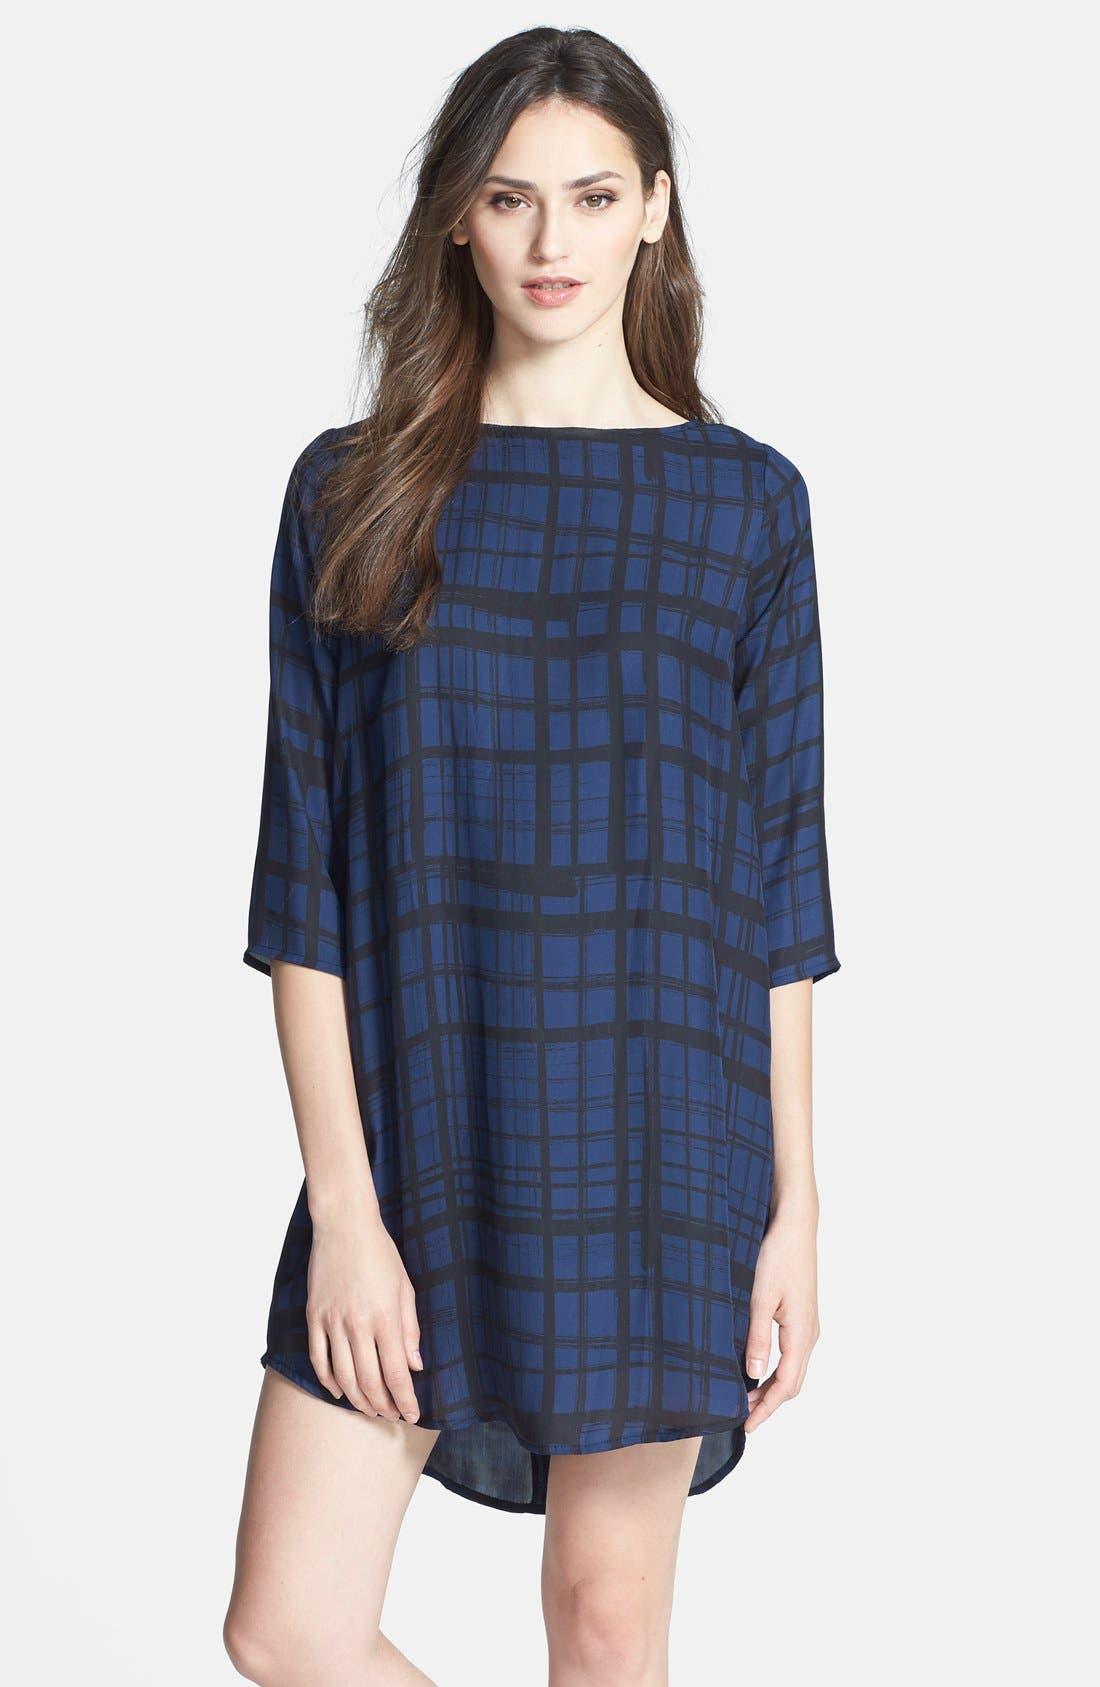 Alternate Image 1 Selected - BB Dakota 'Musetta' Print Shift Dress